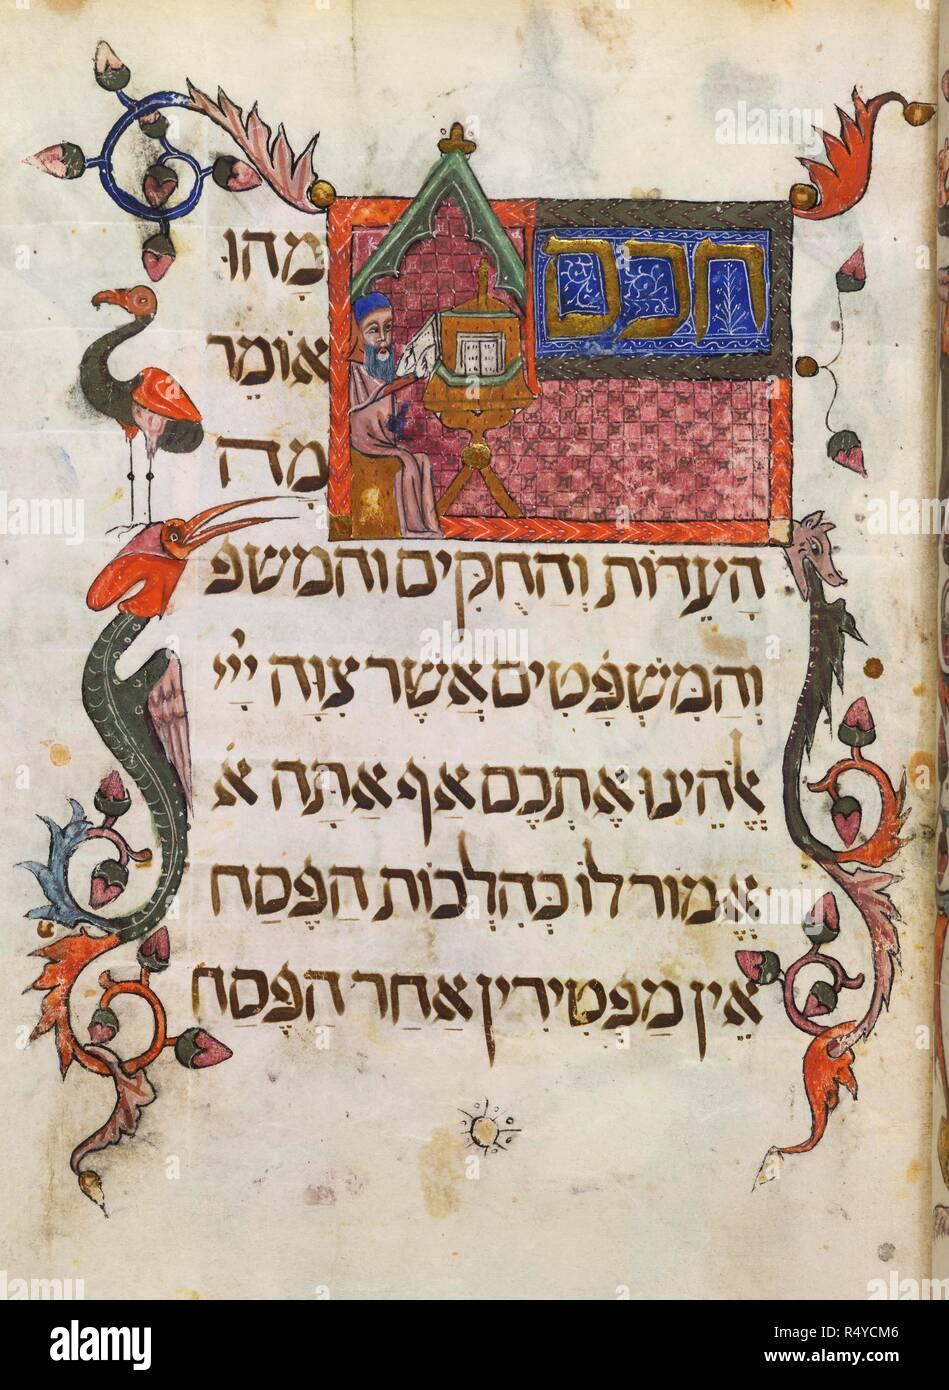 Illuminated folio from the 'Barcelona Haggadah'. Barcelona Haggadah. Catalonia, 14th century. Source: Add. 14761, f.34. Language: Hebrew. - Stock Image